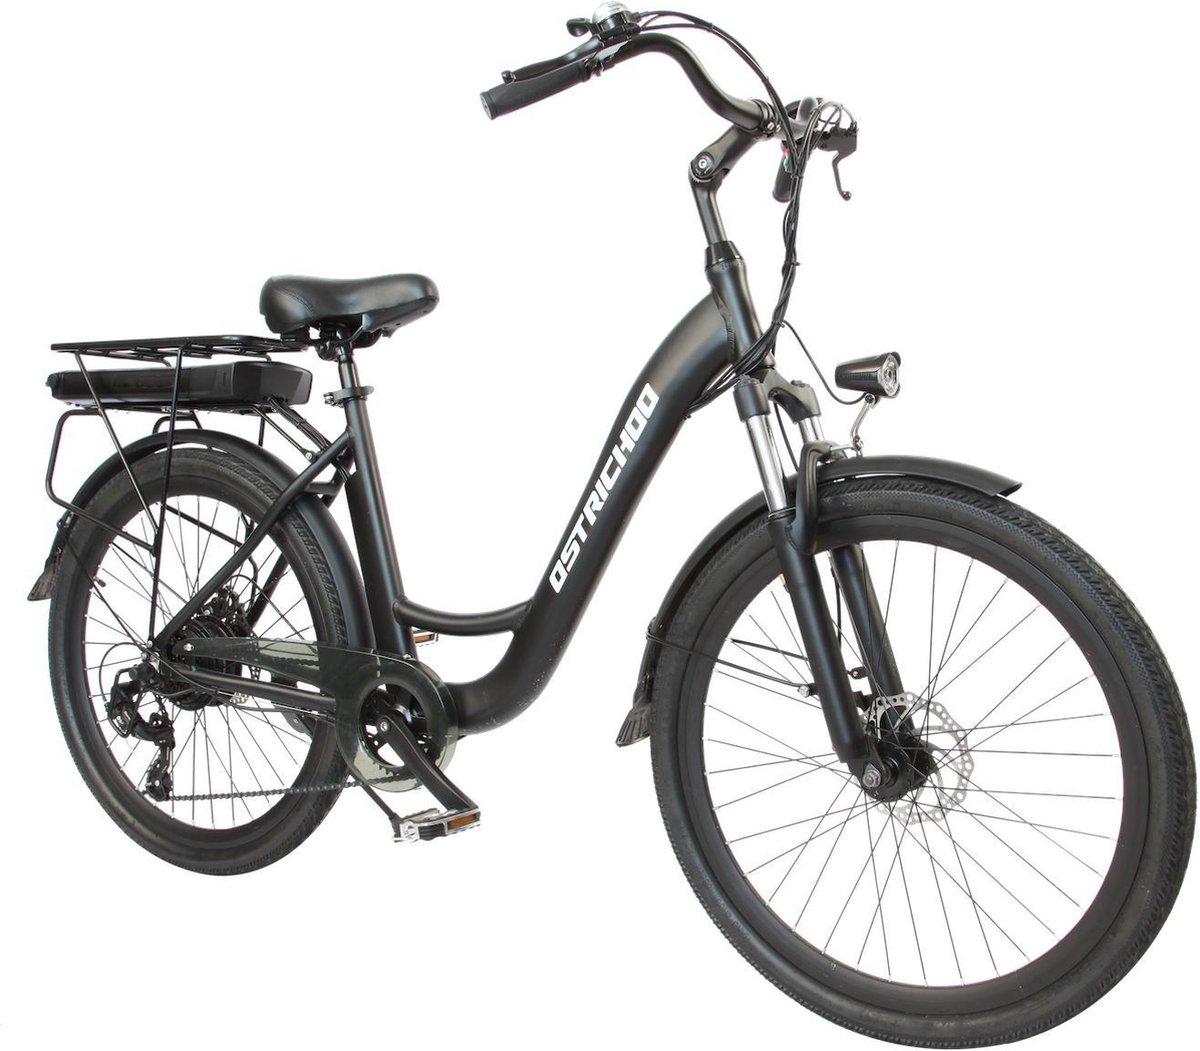 "Ostrichoo Julius elektrische fiets 26"" - NIEUWE accu-technologie!"